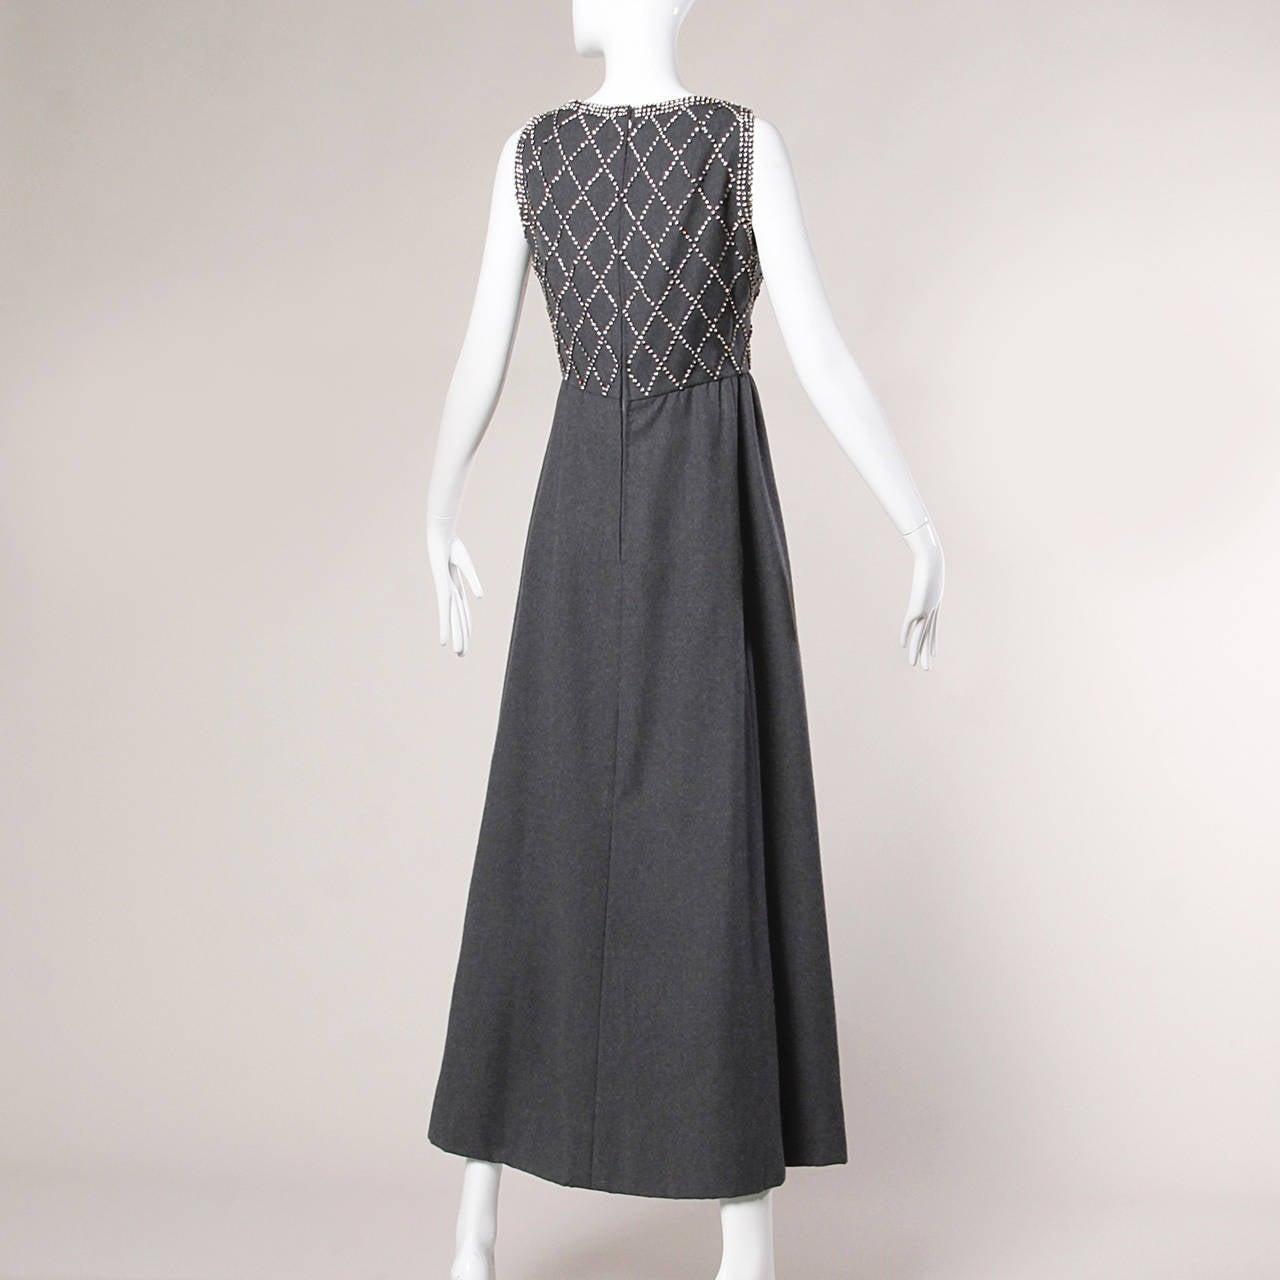 Black Malcolm Starr Vintage 1960s Gray Wool Rhinestone Embellished Maxi Dress For Sale